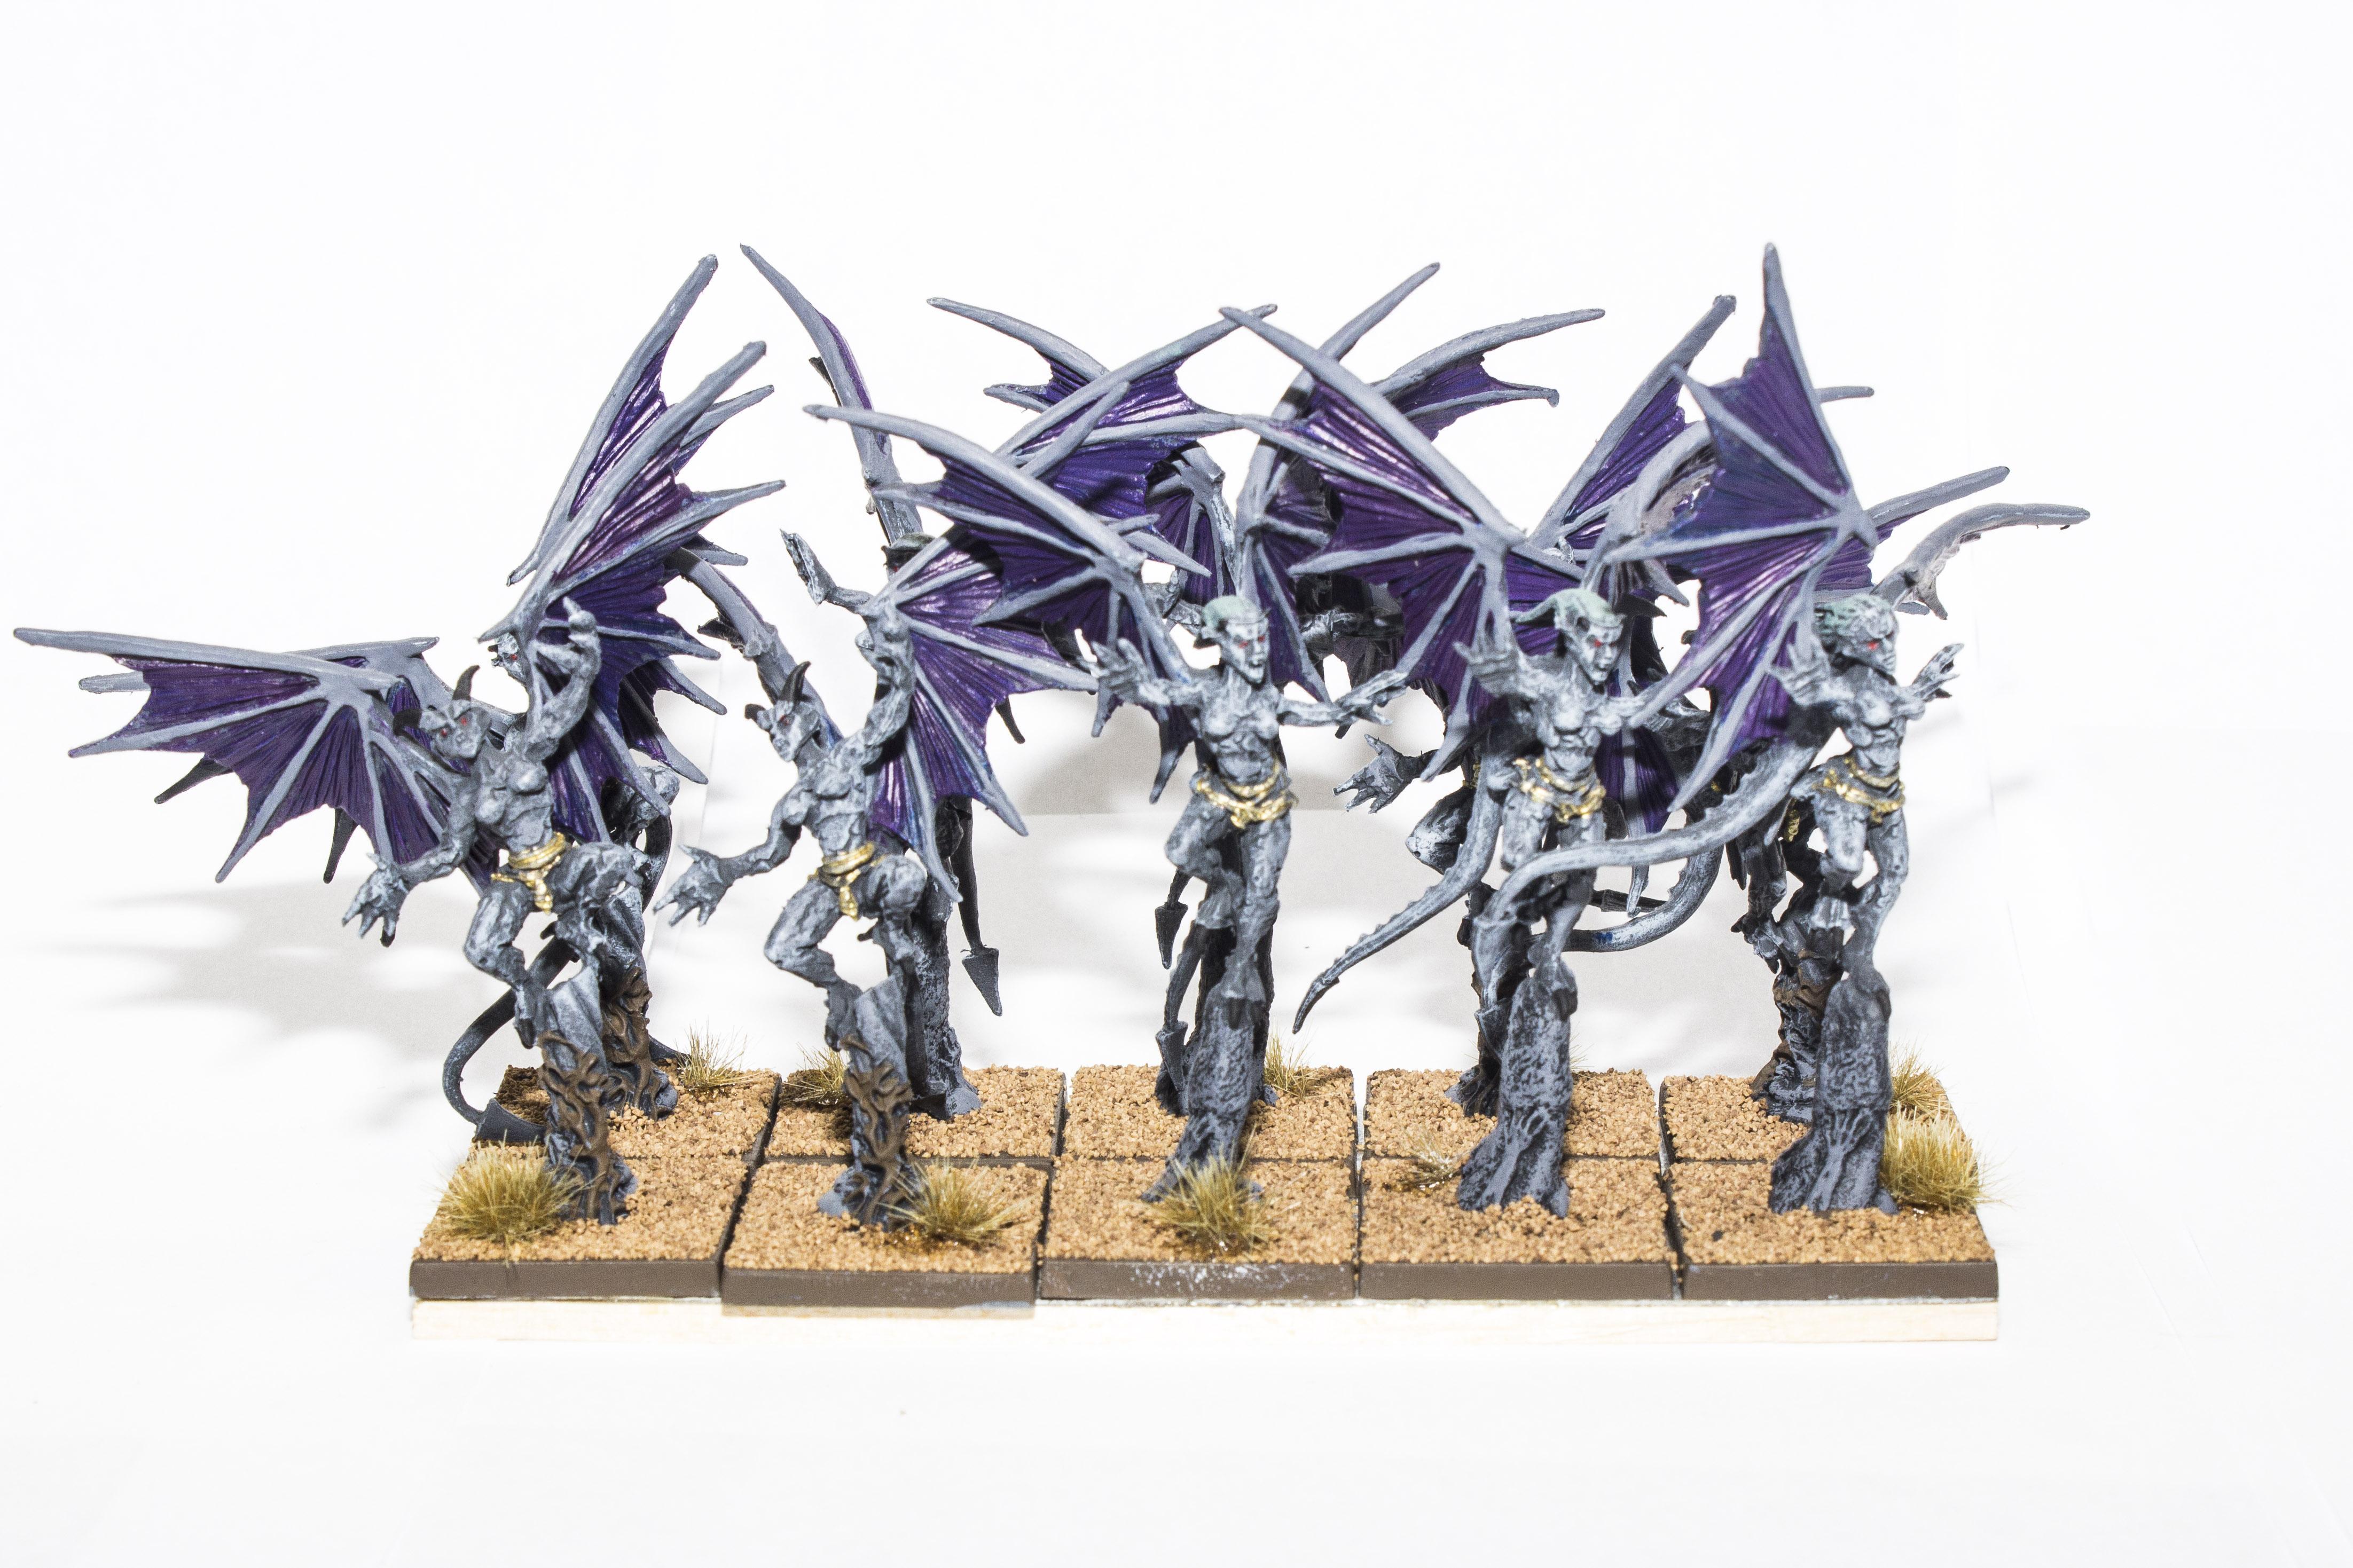 Abyssal_Dwarves_Gargoyles_2